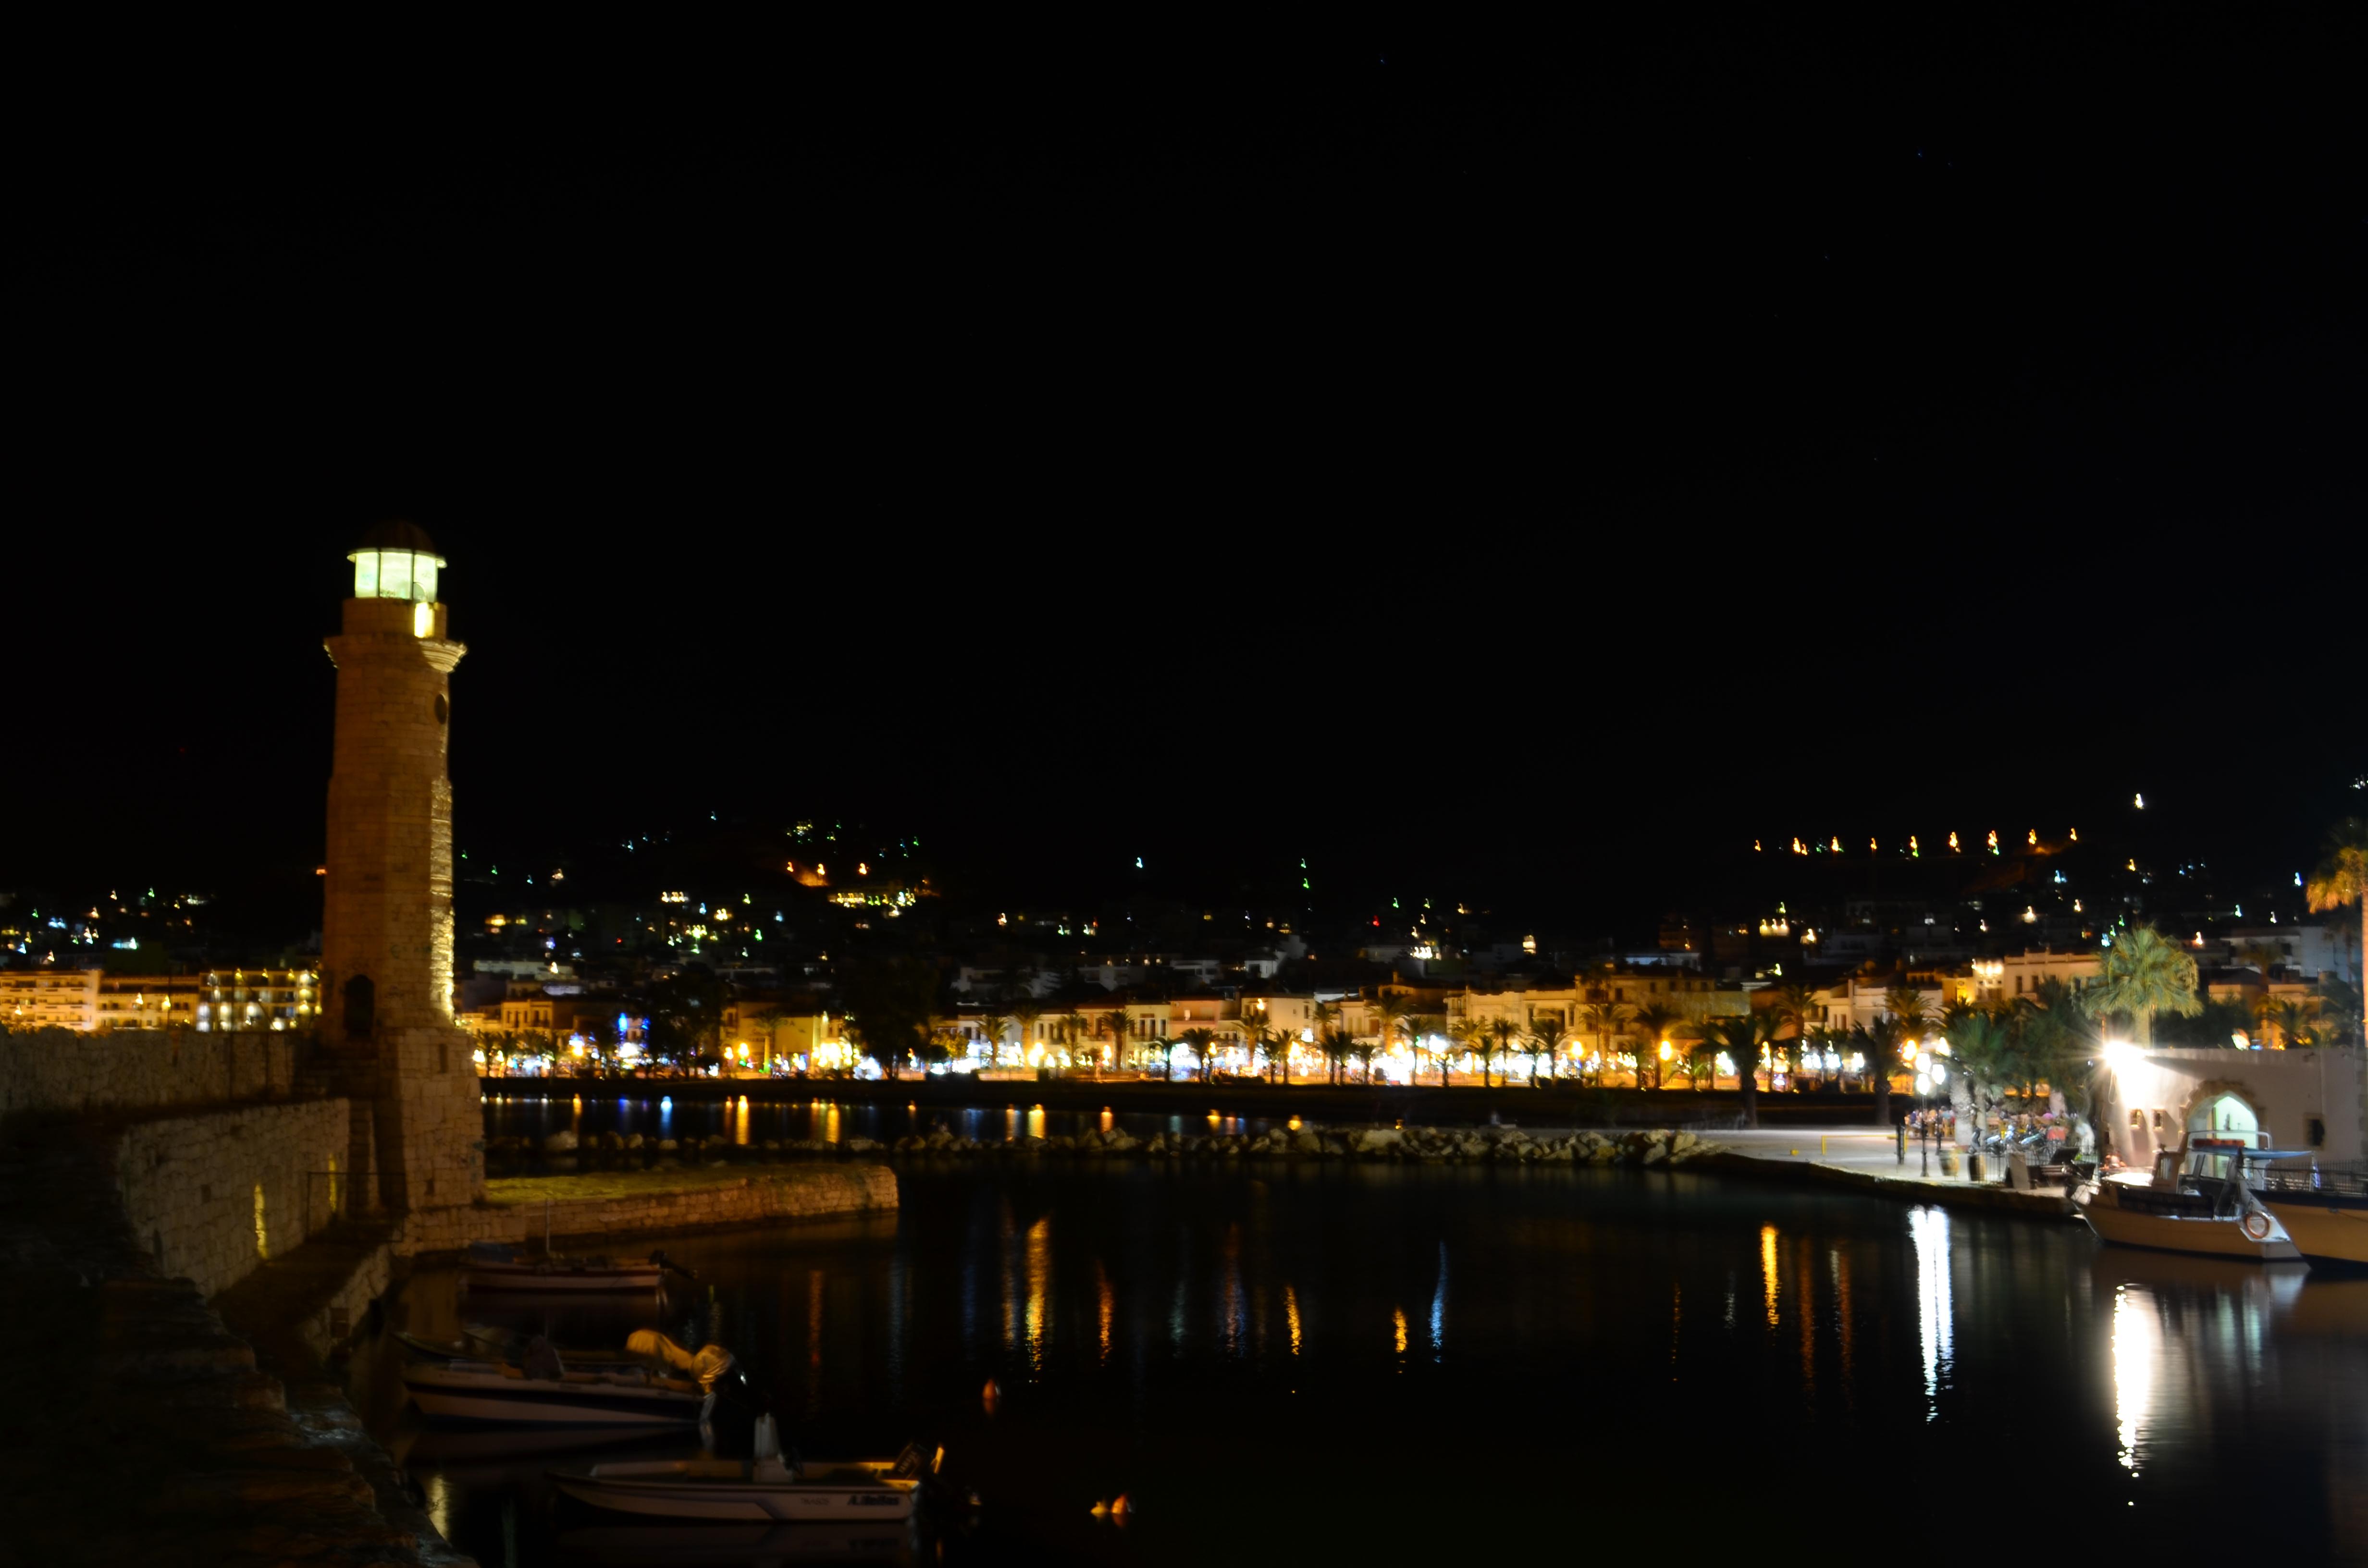 Rethymno at night.